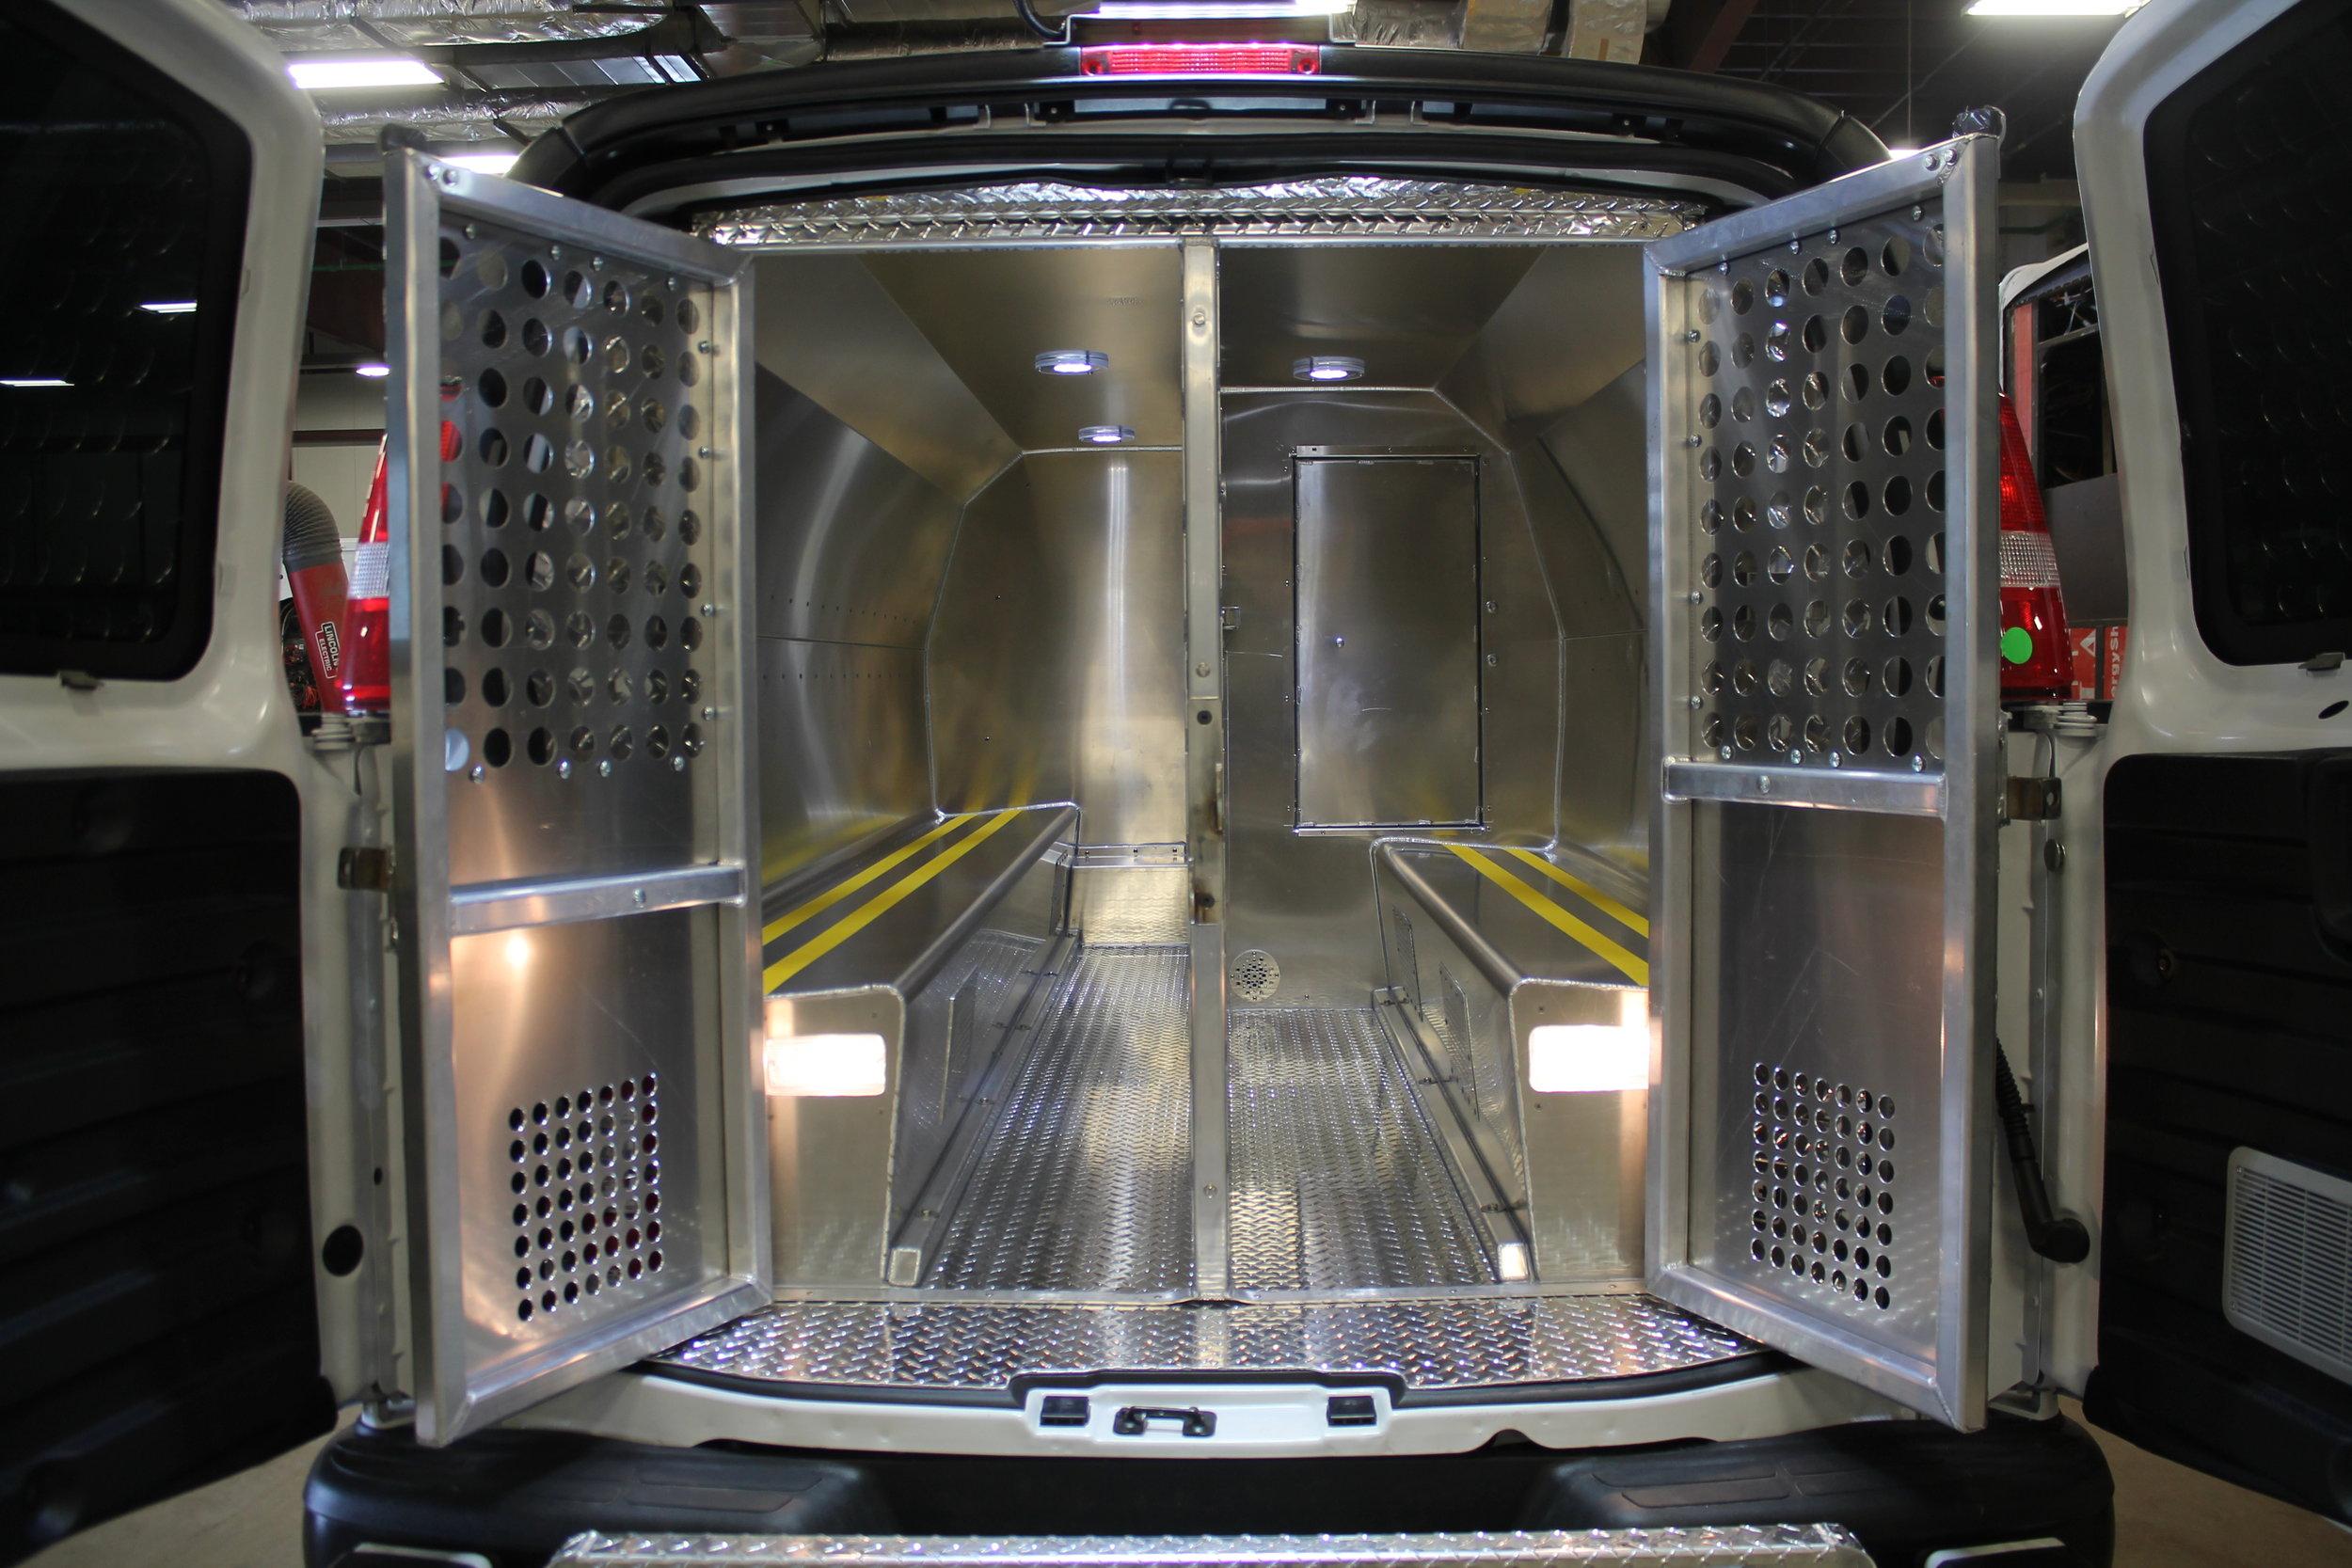 prisoner transport unit - nunavut